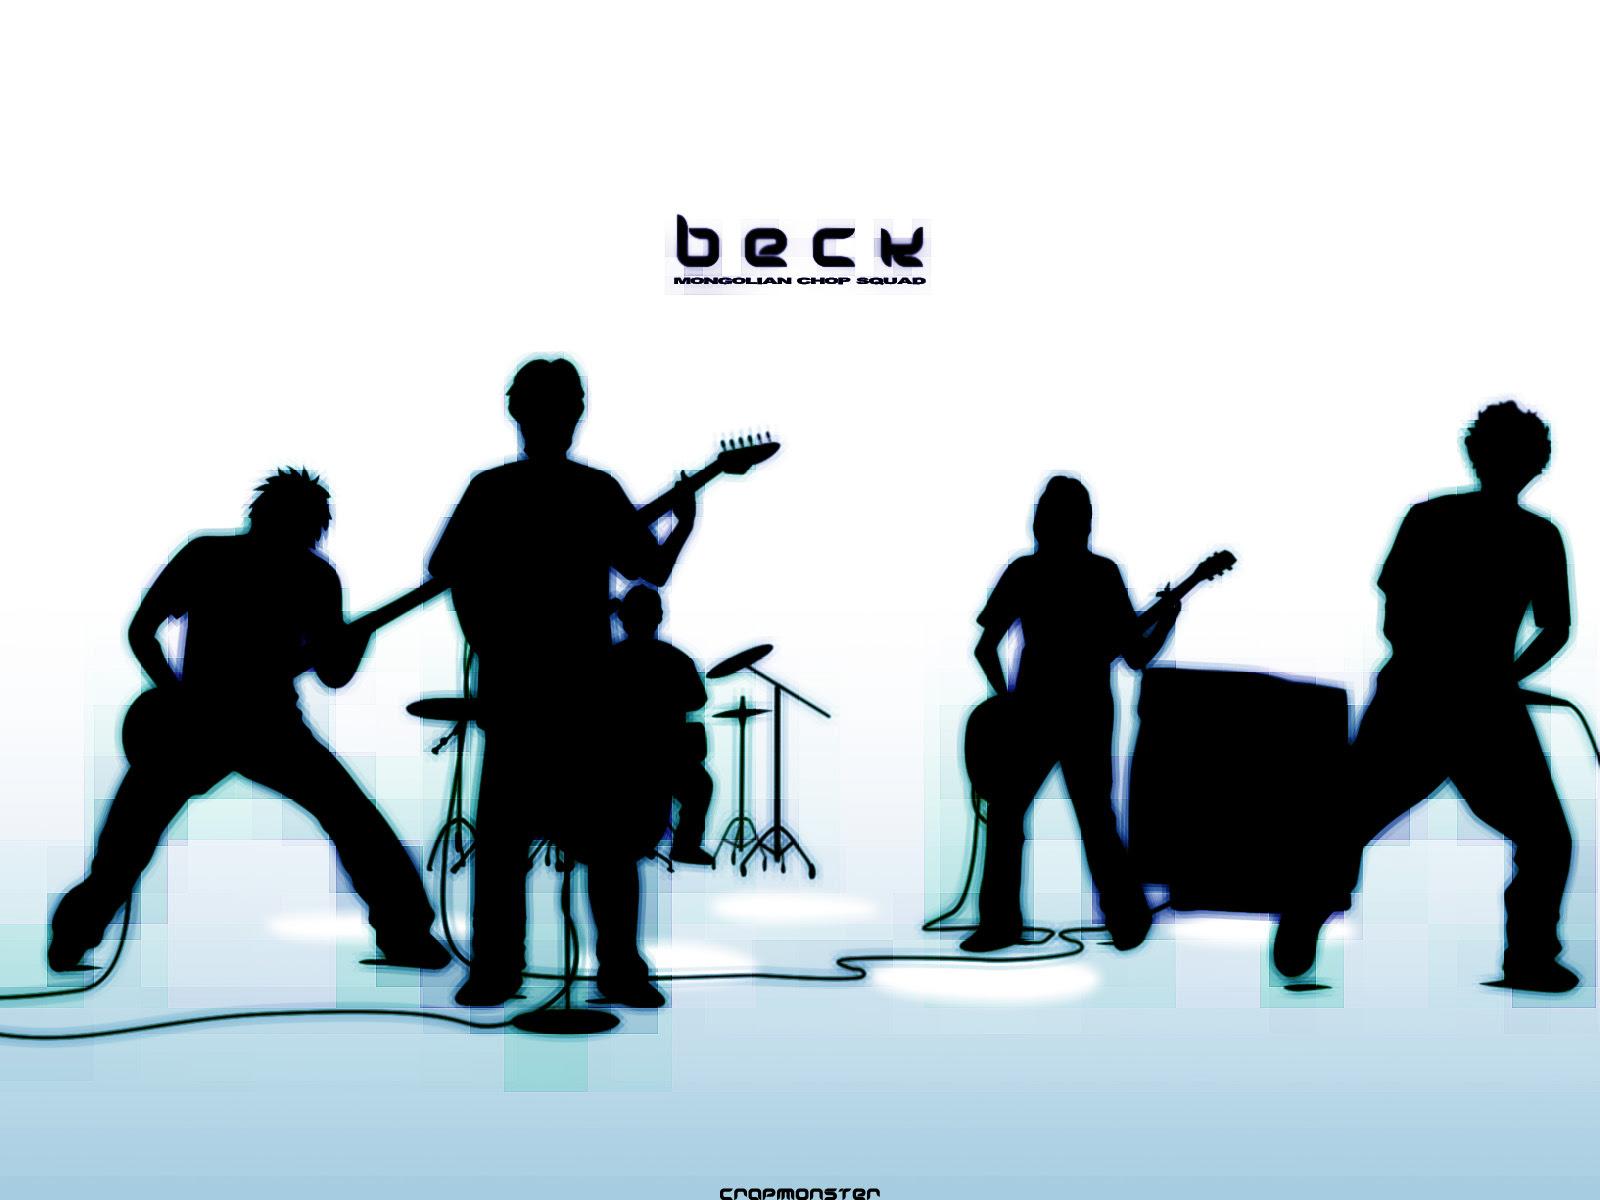 BECK Wallpaper: Beck Vector - Minitokyo